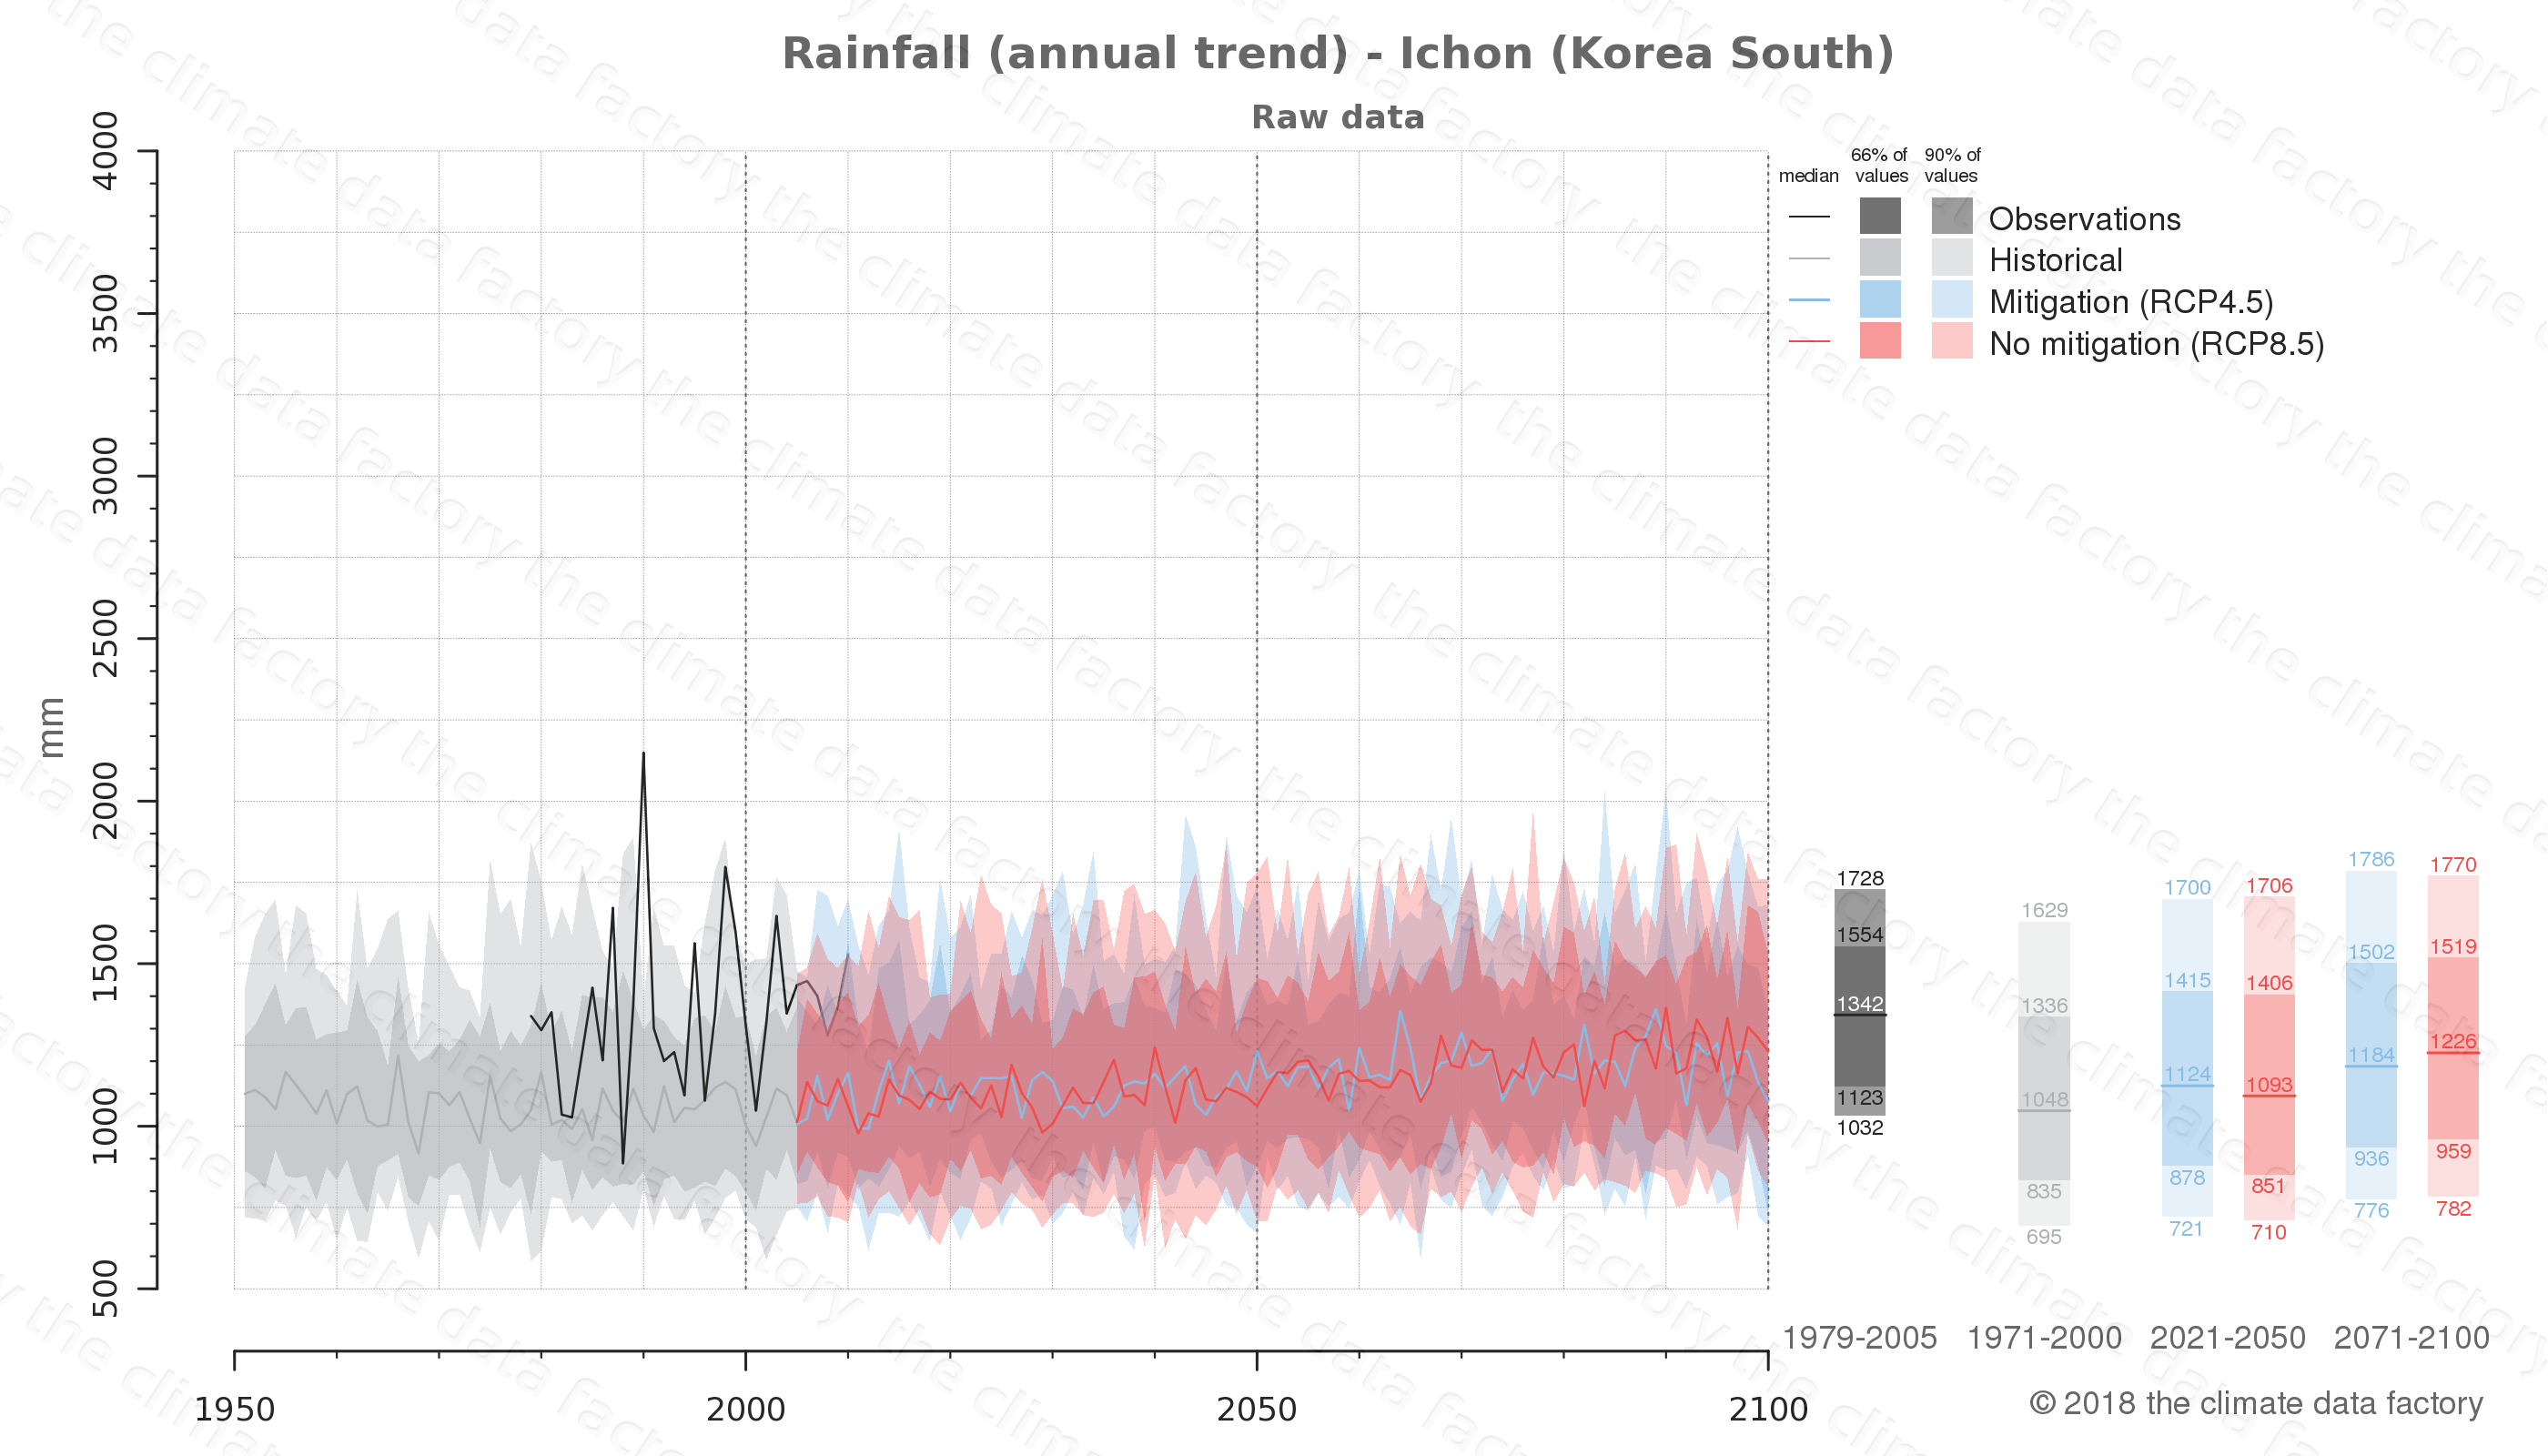 climate change data policy adaptation climate graph city data rainfall ichon south korea